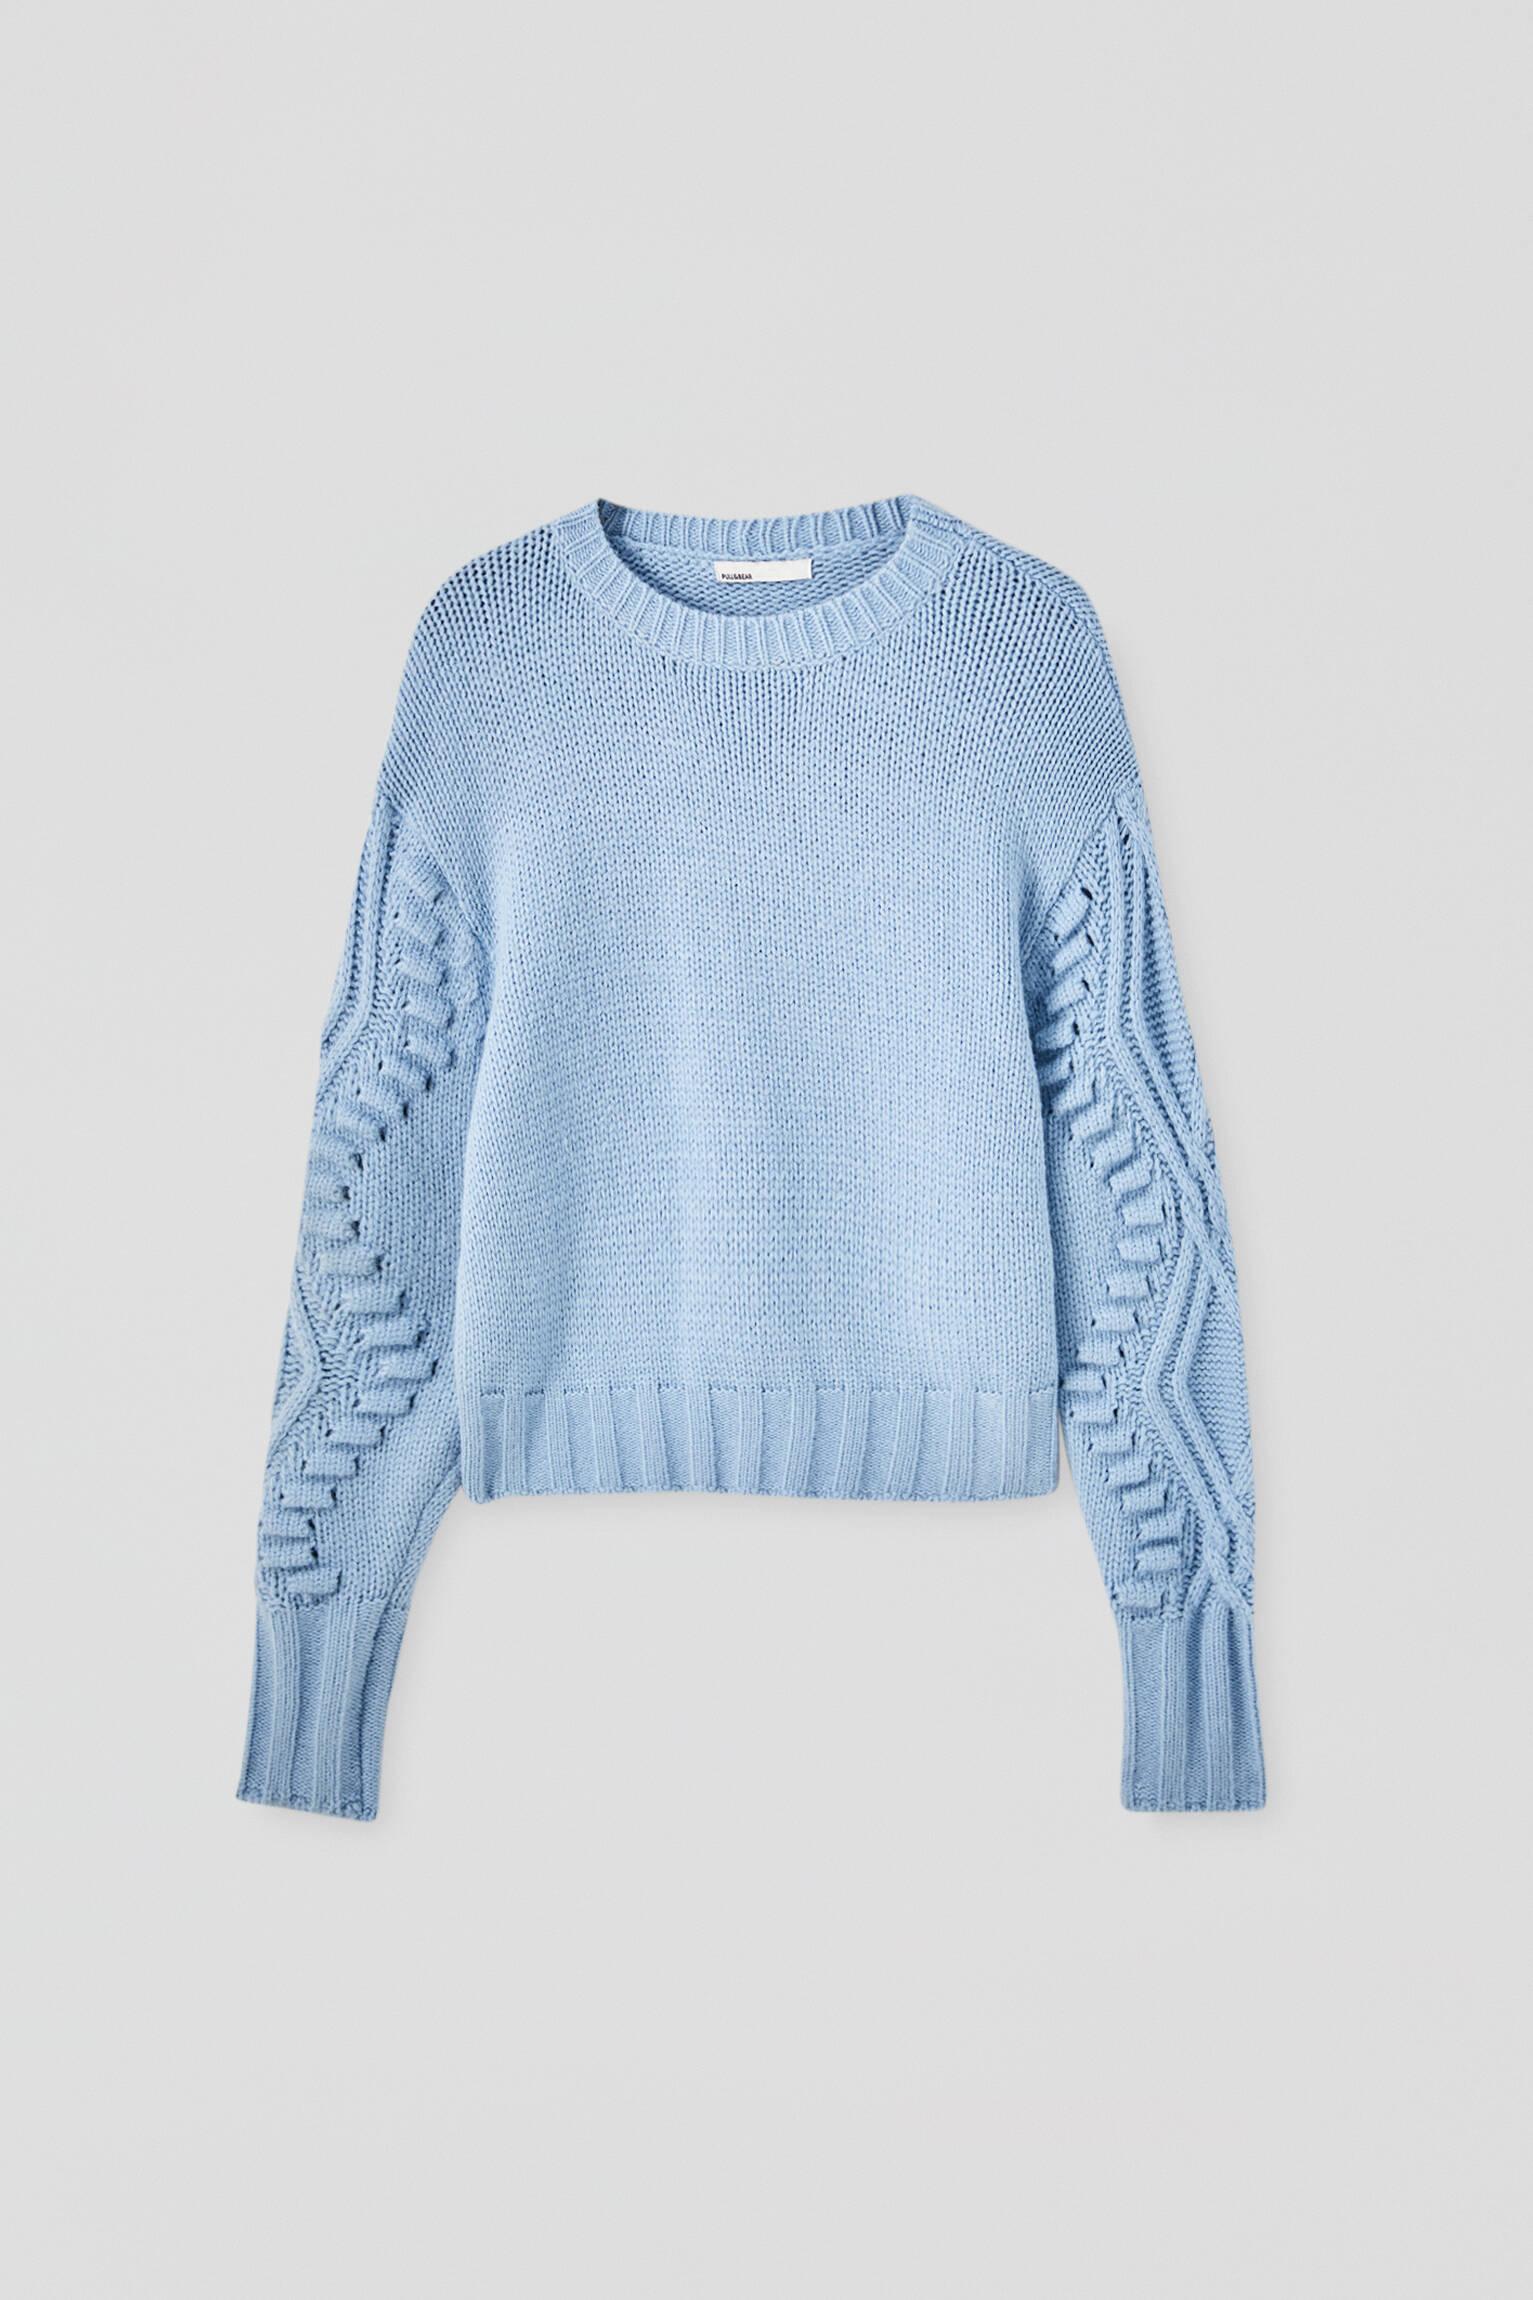 Синий свитер крупной вязки с узором «косы» ГОЛУБОЙ Pull & Bear